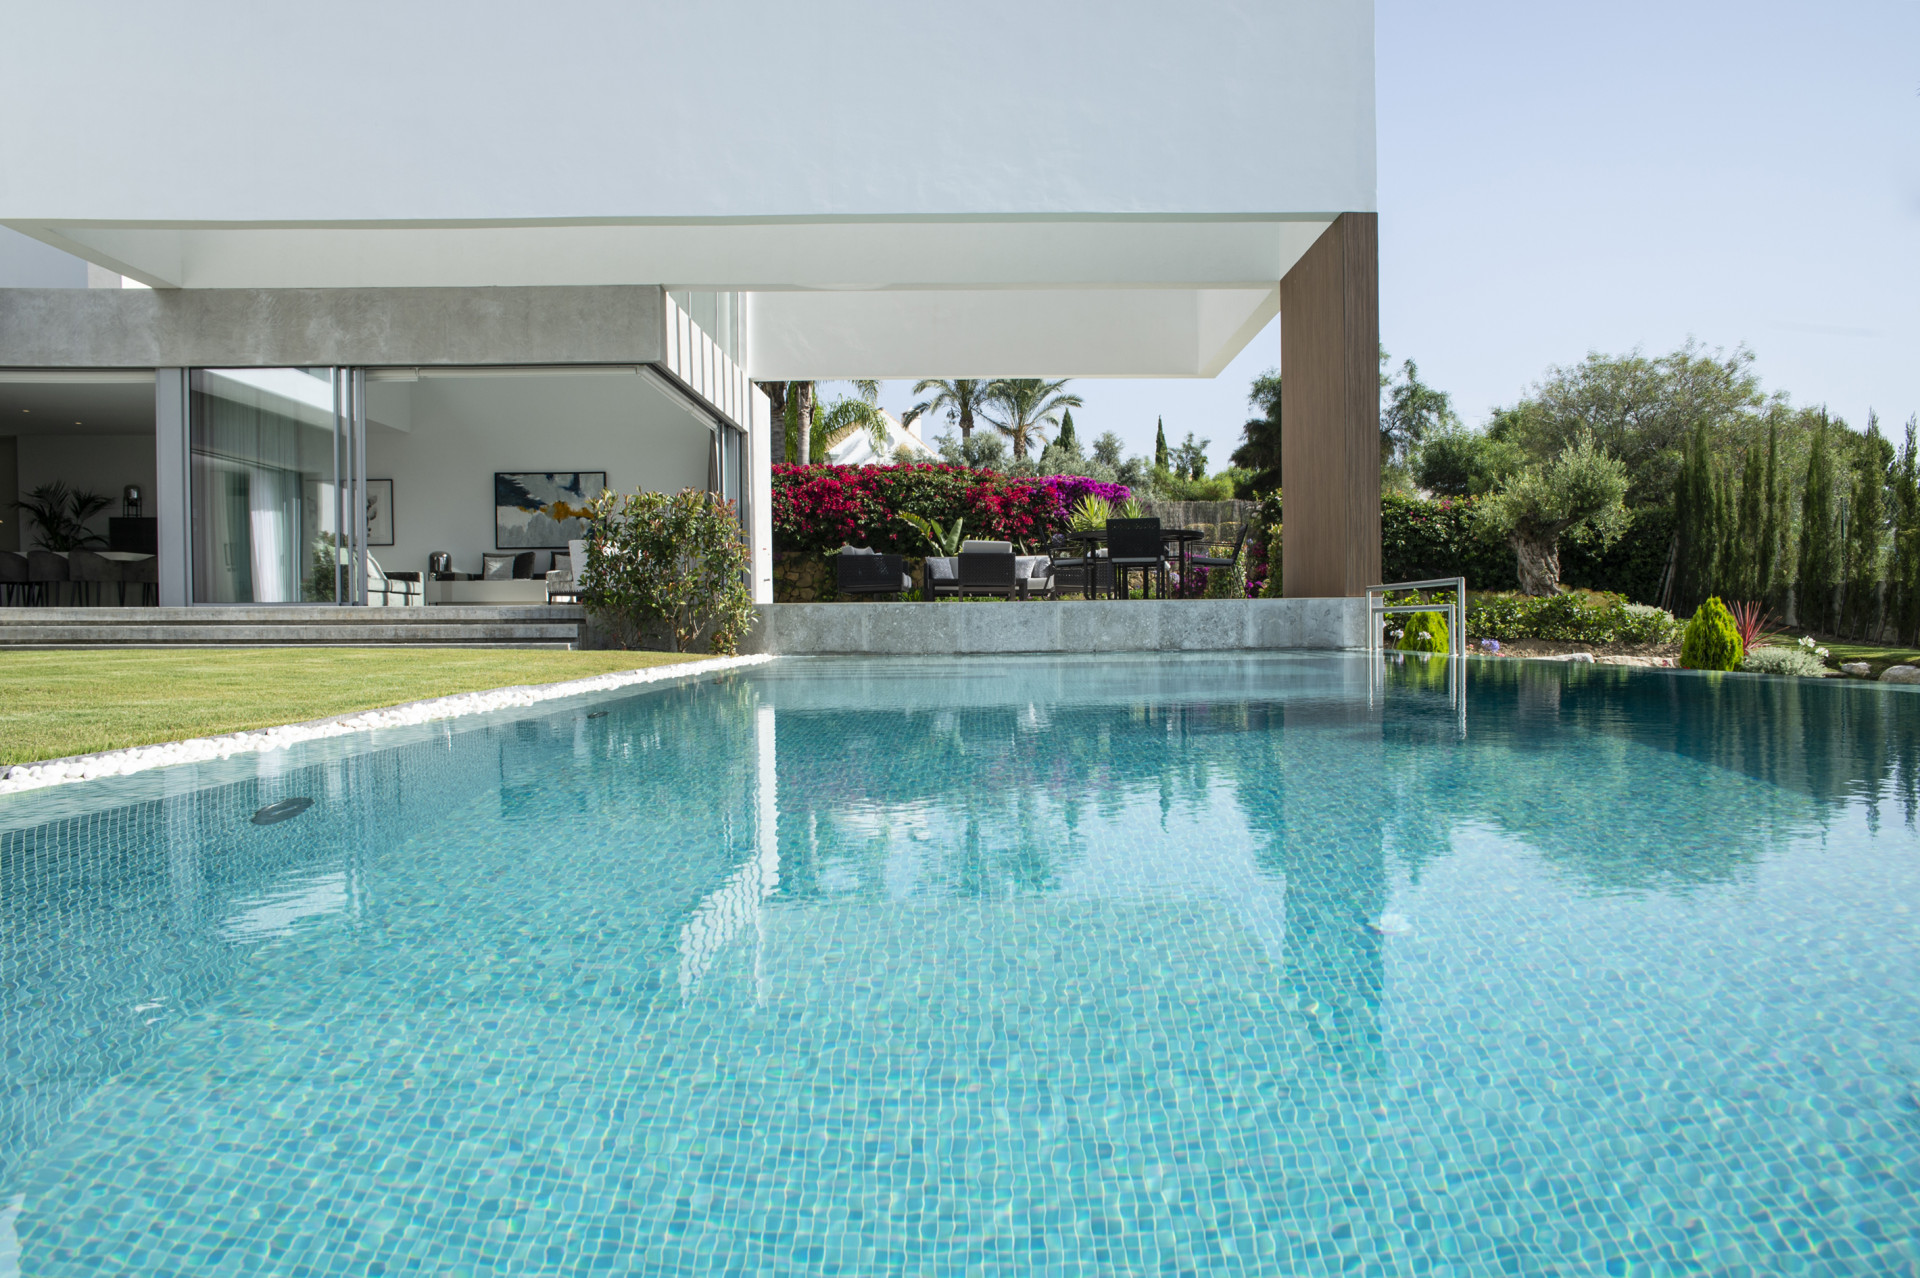 ARFV2166 Villa moderna a la venta en Benahavis, en Los Flamingos Golf